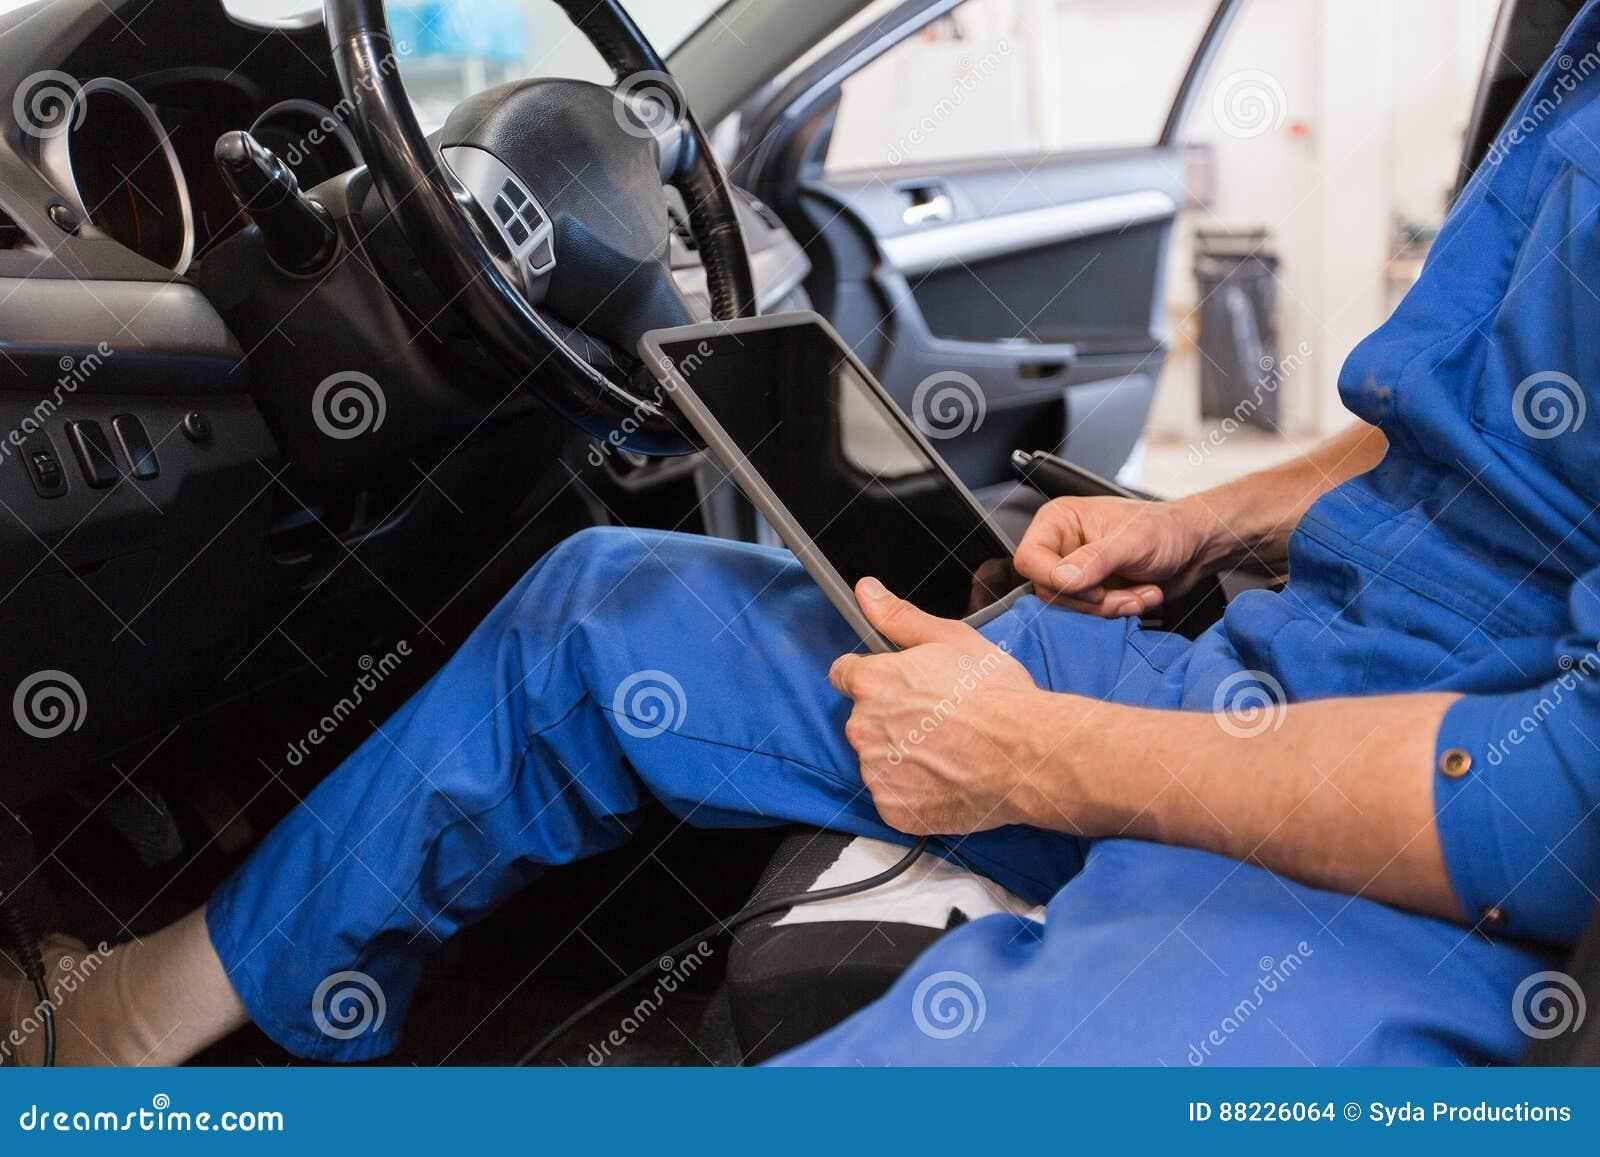 Car Diagnostic App >> Mechanic Man With Tablet Pc Making Car Diagnostic Stock Photo   CartoonDealer.com #88226064